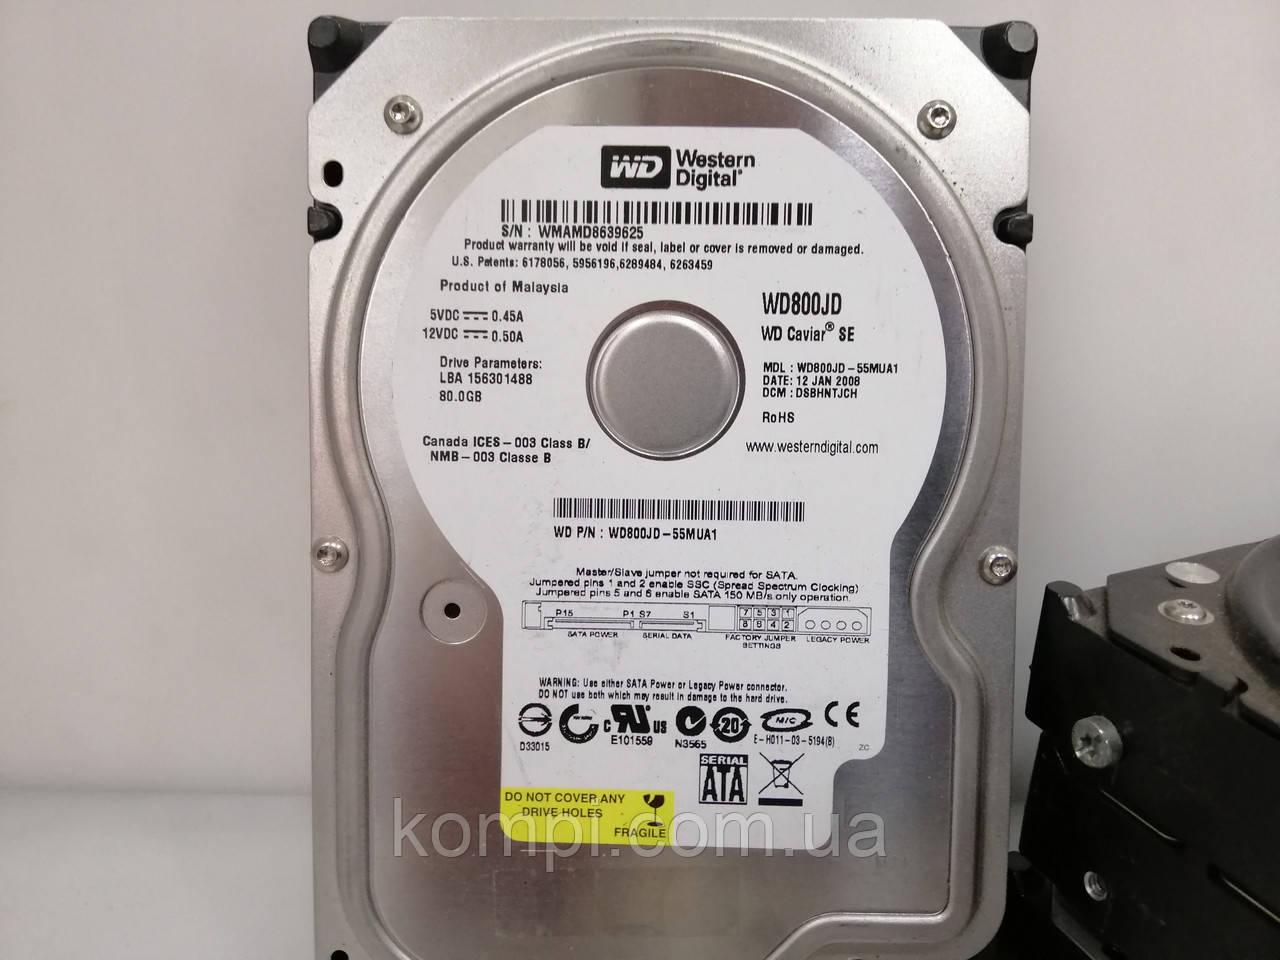 HDD Жорсткий диск 3.5 80Gb Western Digital 80GB 7200rpm 8MB WD800JD SATAII ІДЕАЛЬНИЙ СТАН!!